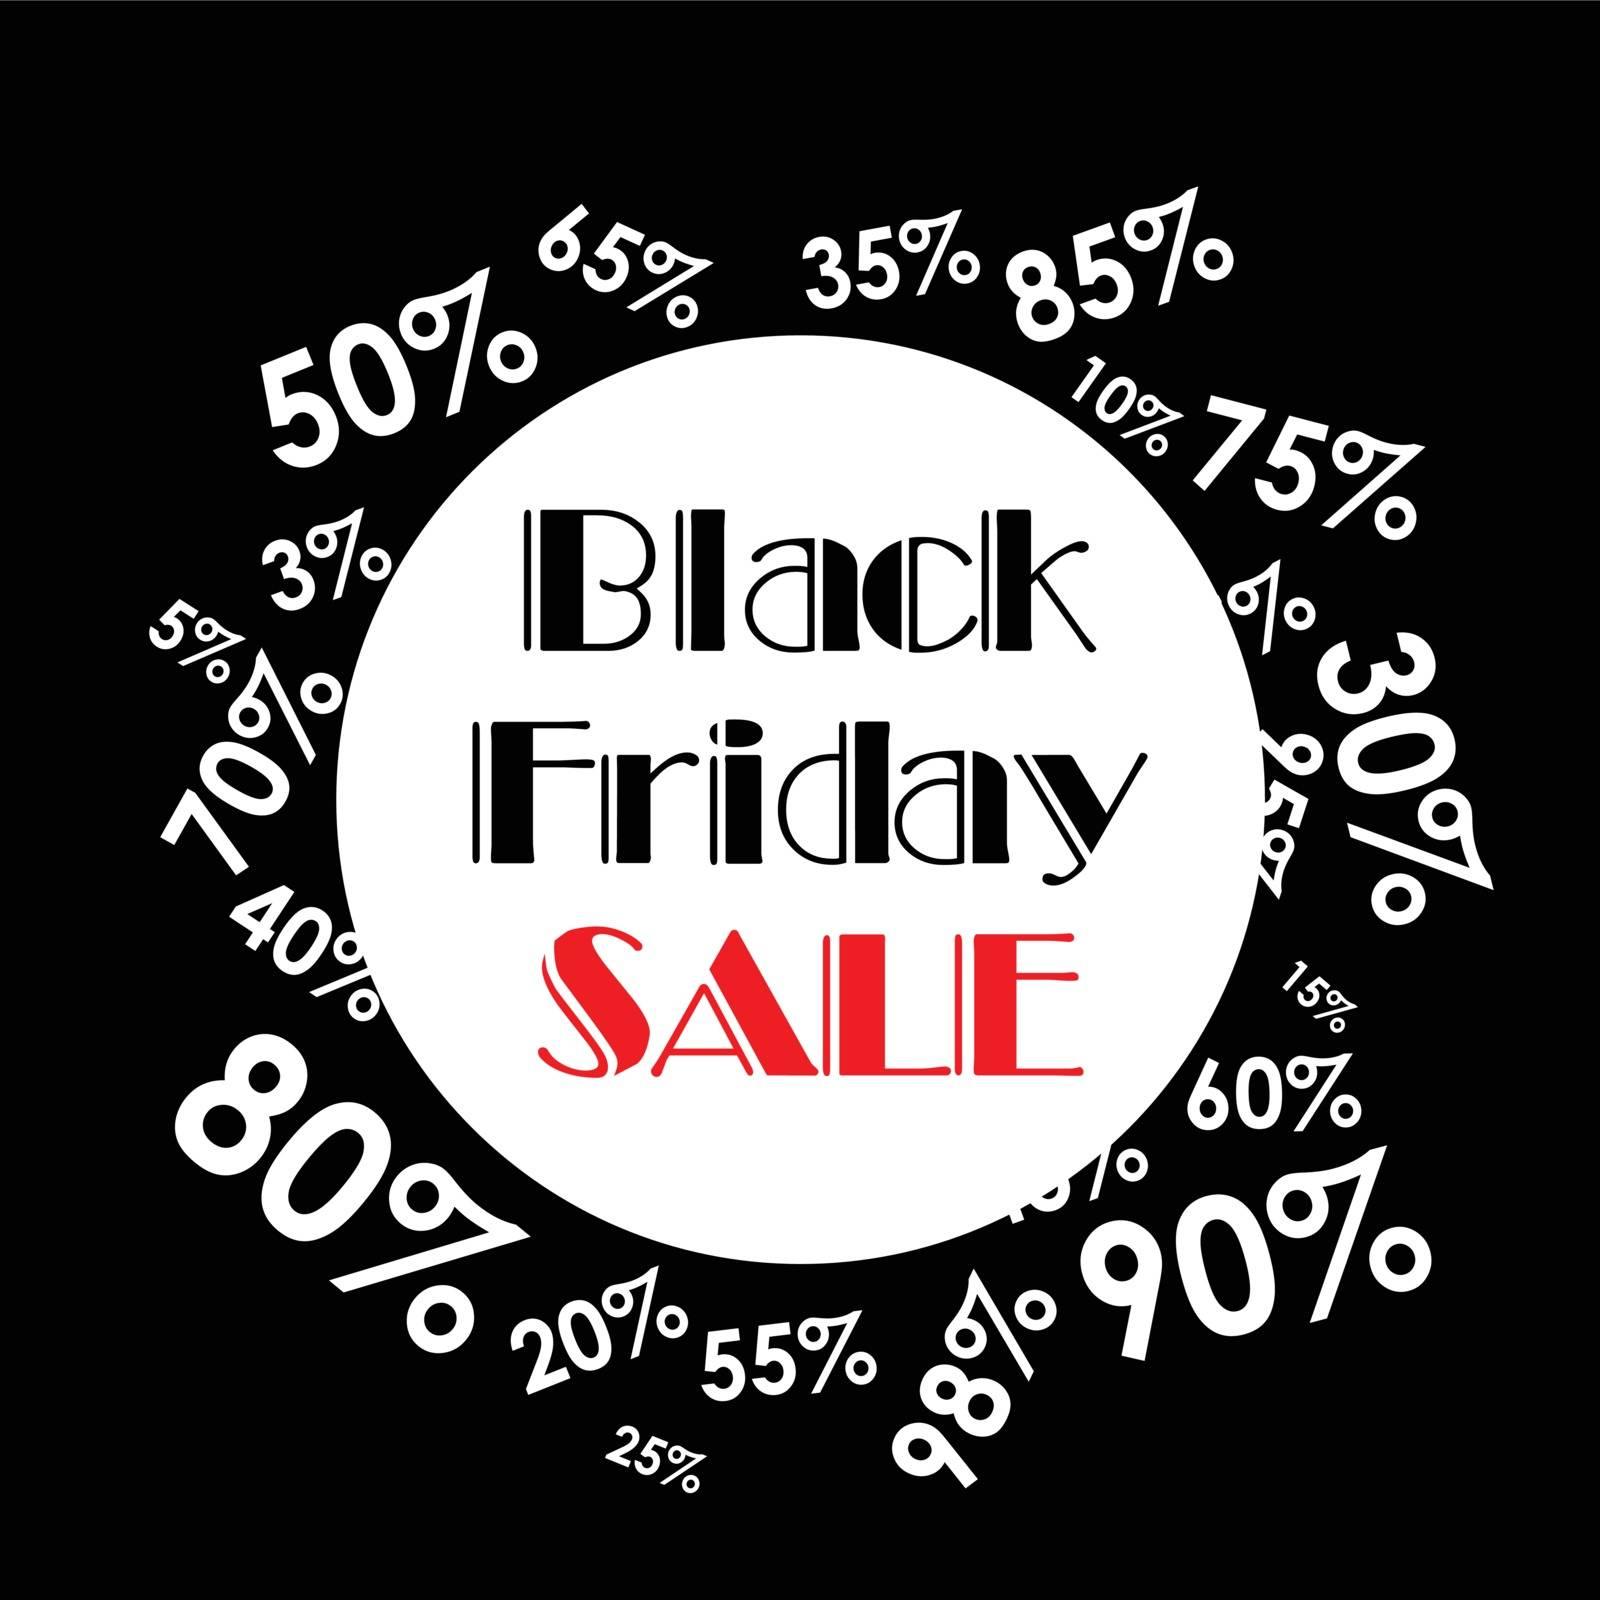 Vector illustration. Black Friday sales. Black poster.